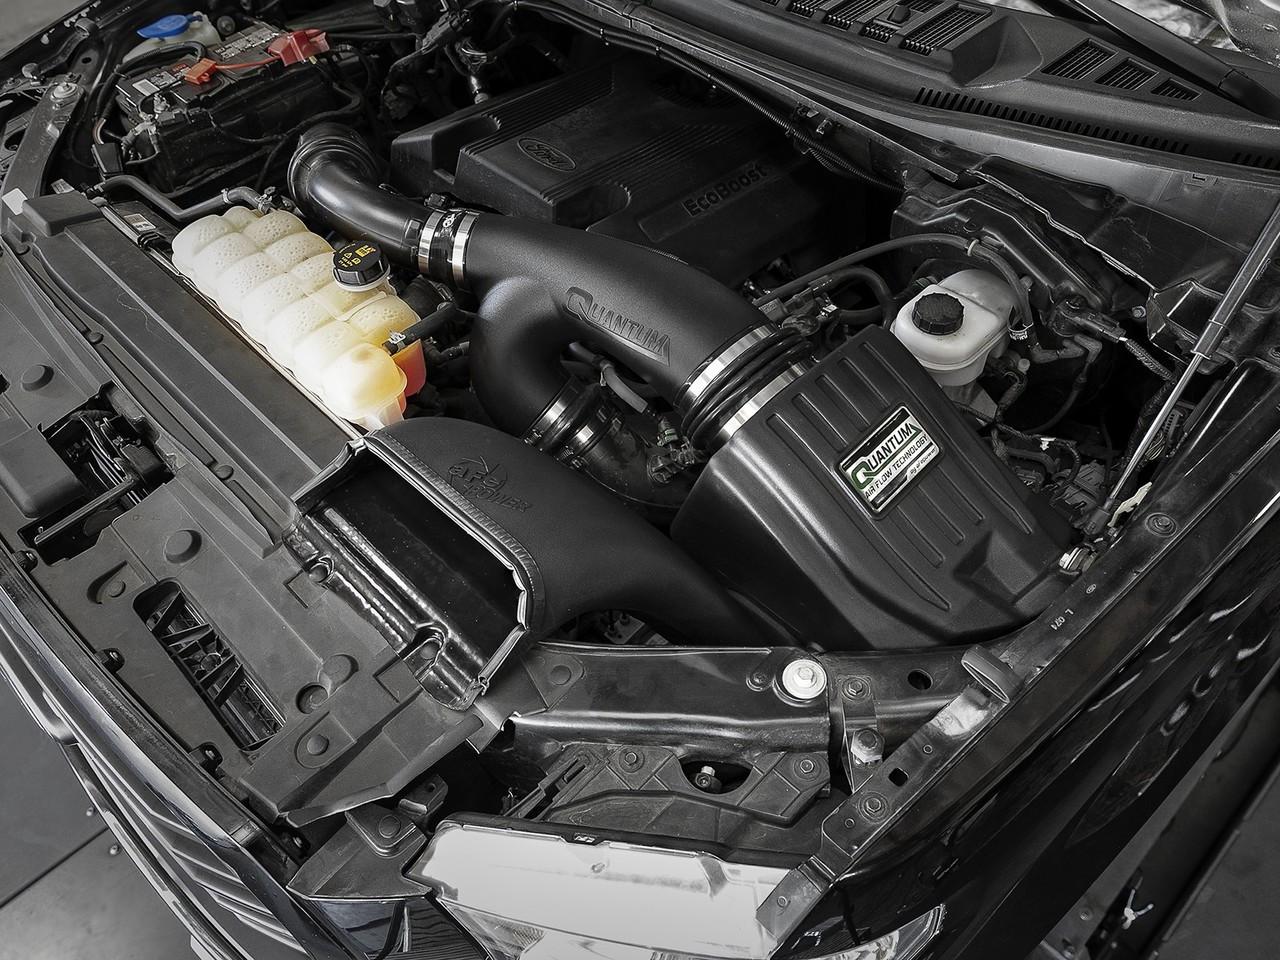 Afe 53 10008d Quantum Pro Dry S Cold Air Intake System For 15 18 Ford F150 Ecoboost V6 35l27l